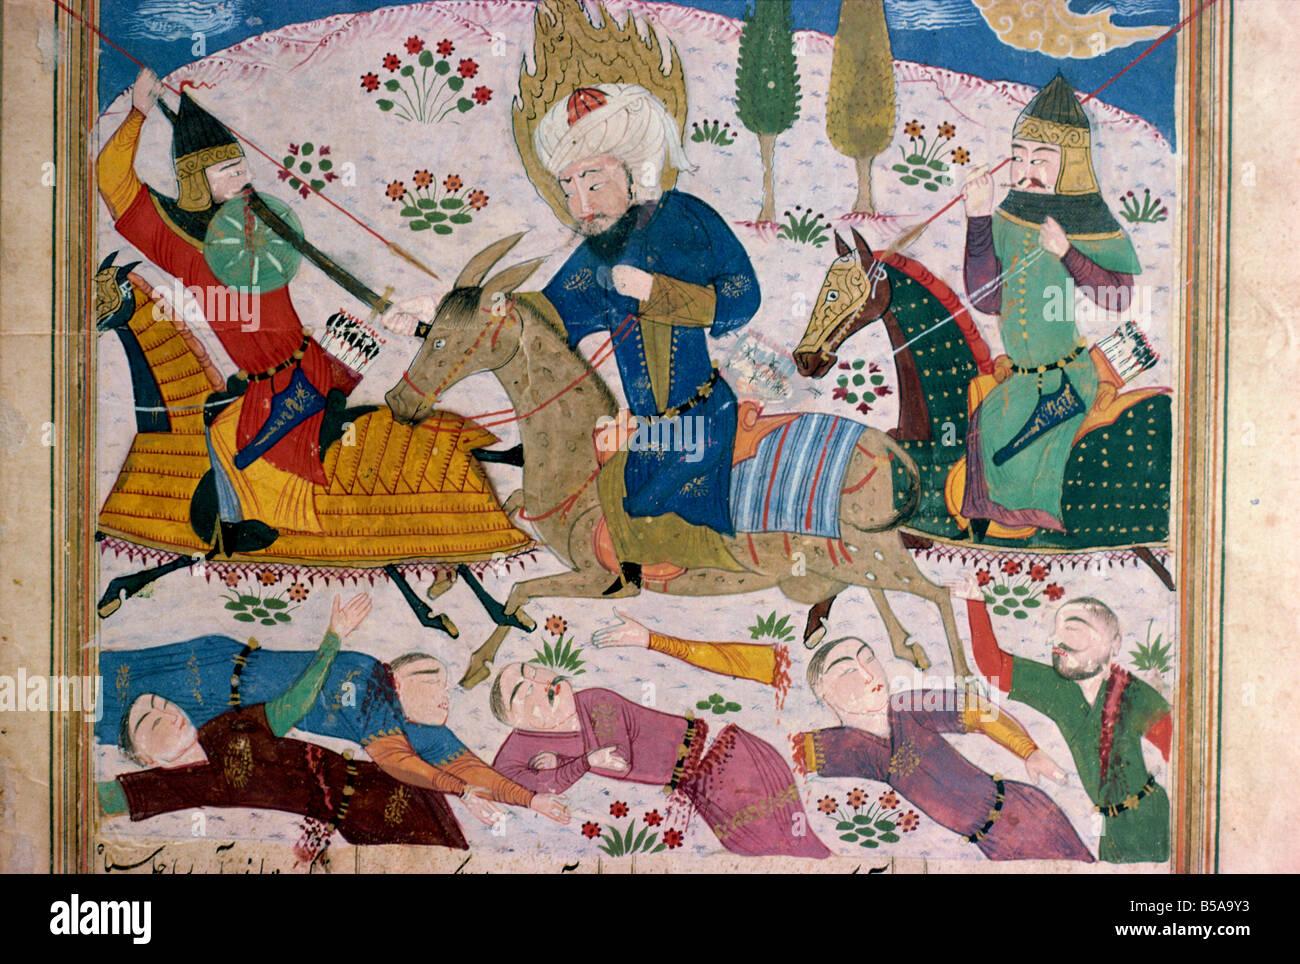 Nama Kwawrain Museo di Arti Decorative Tehran iran medio oriente Immagini Stock